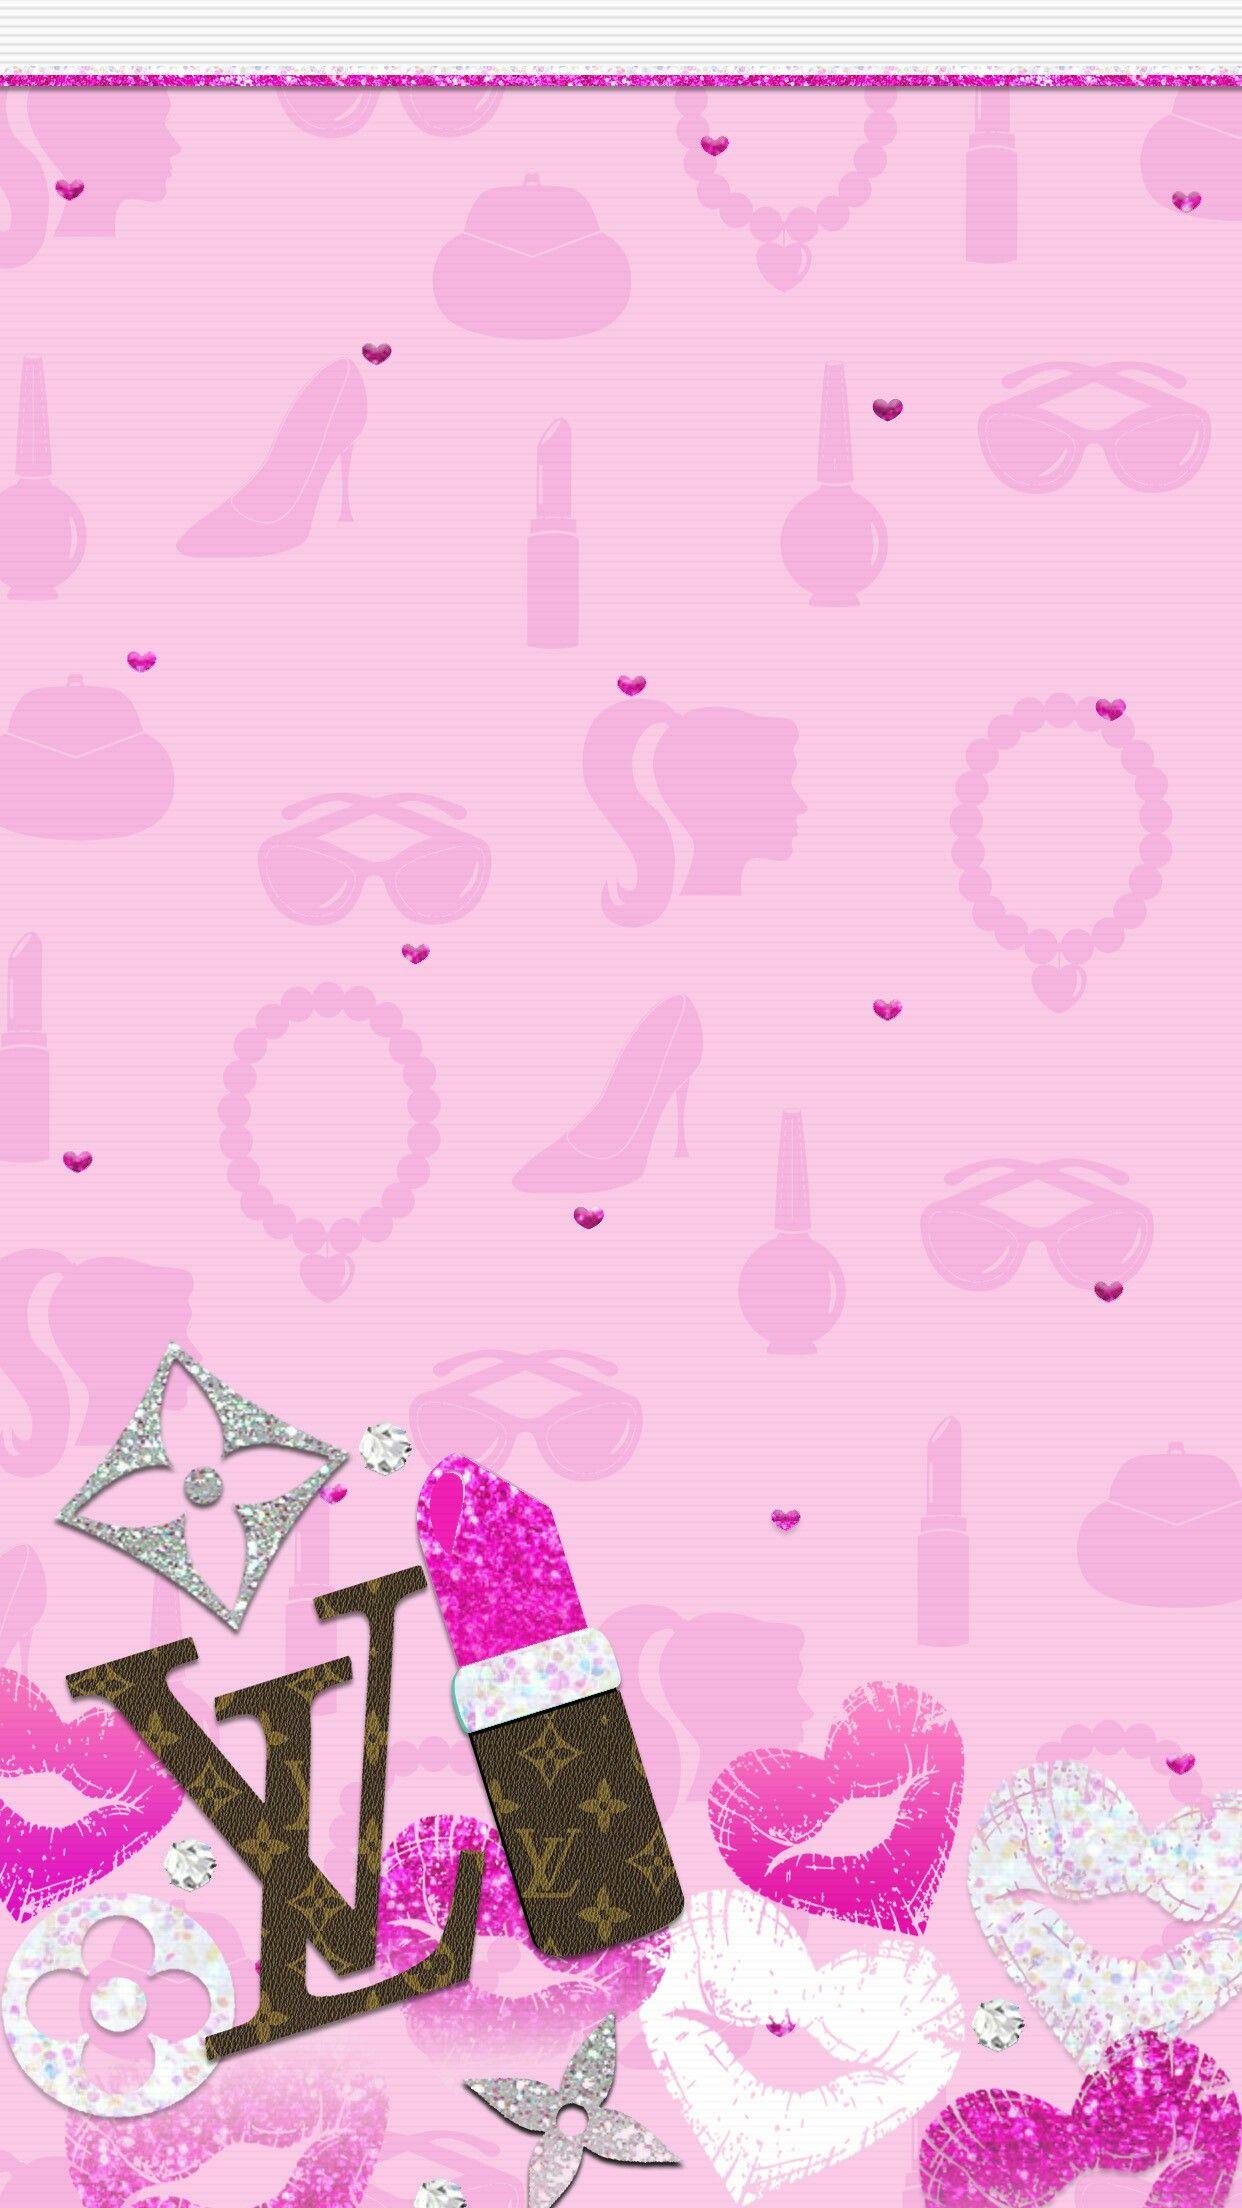 Vanity Pink Wall Glitter Phone Wallpaper Pretty Wallpaper Iphone Iphone Homescreen Wallpaper